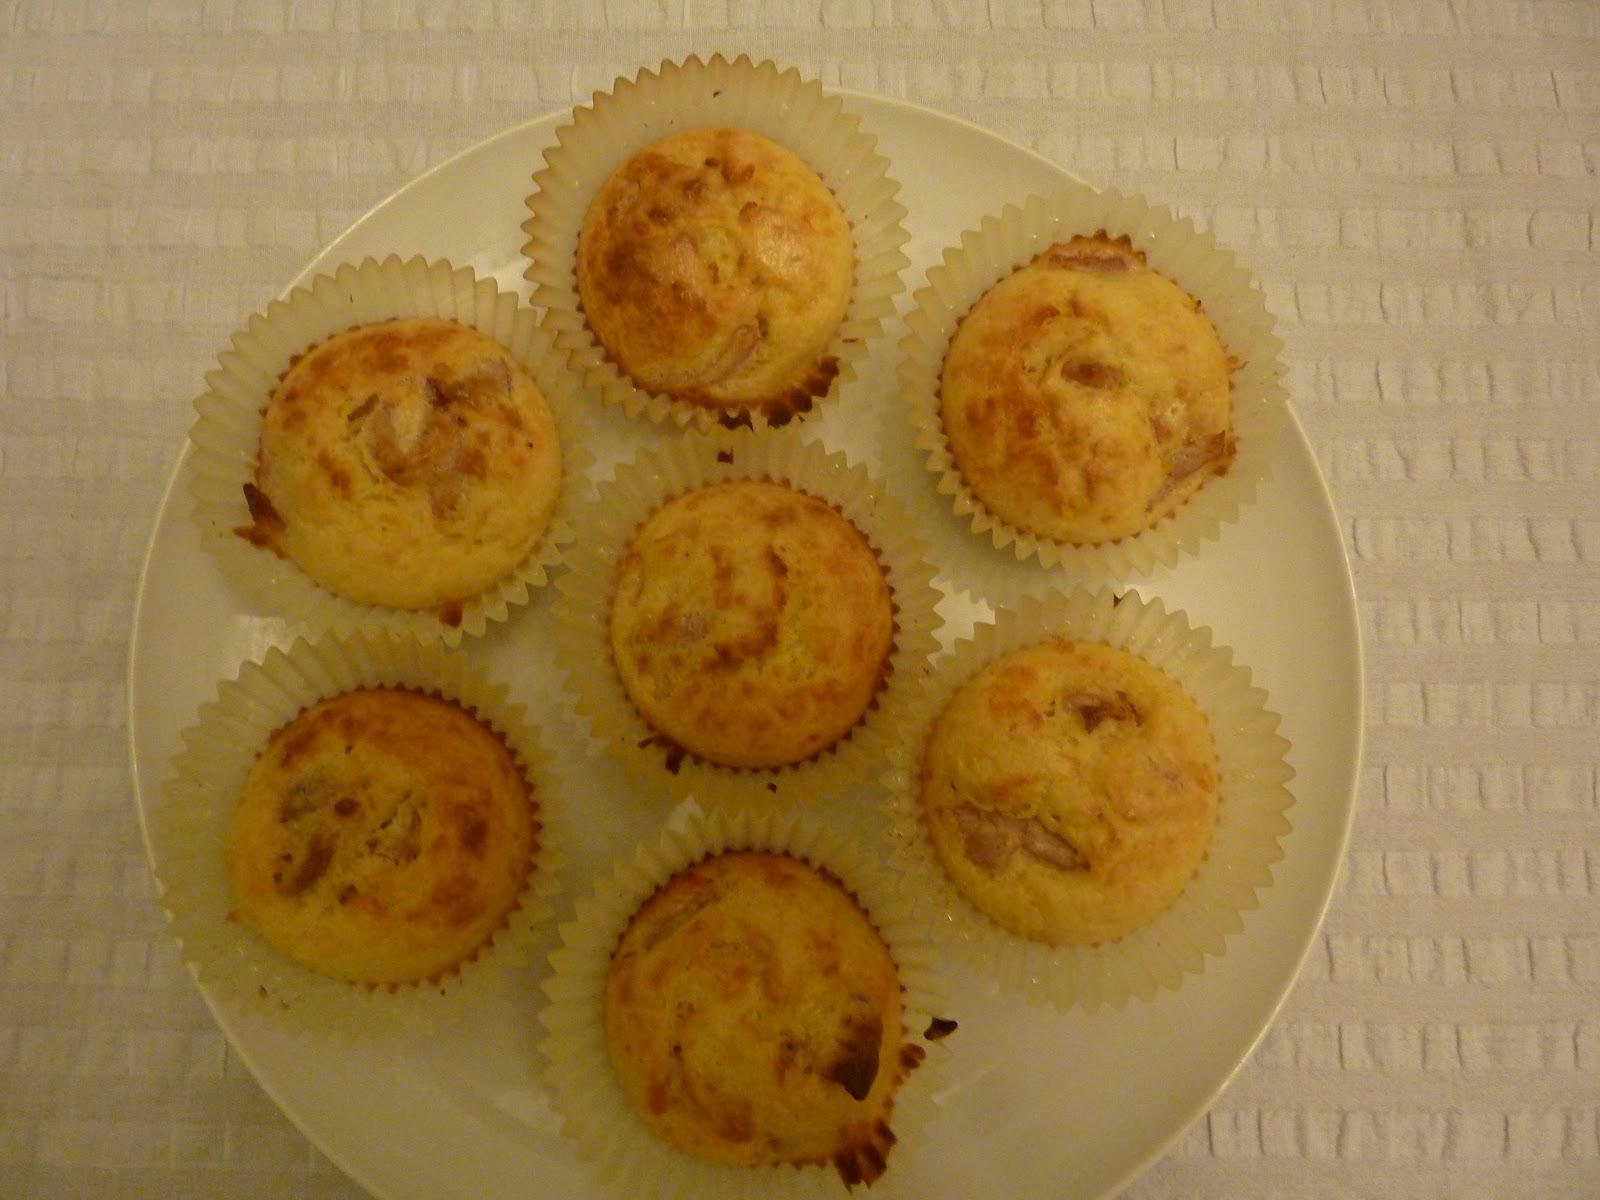 Handmade By Hannah: Egg and Bacon Cupcakes